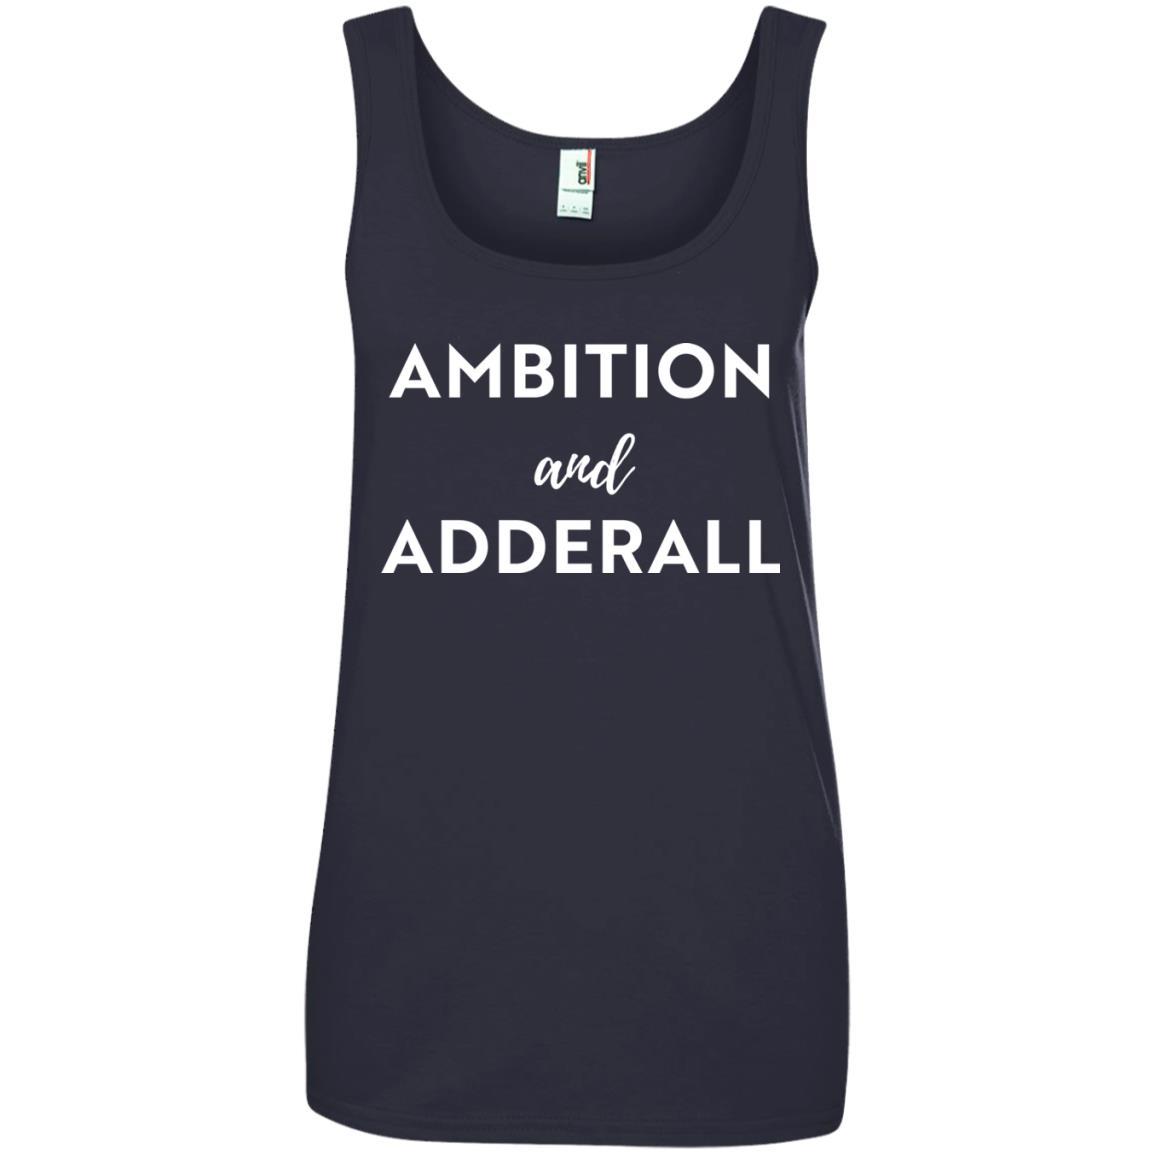 image 10 - Ambition and Adderall T-shirt, Sweatshirt